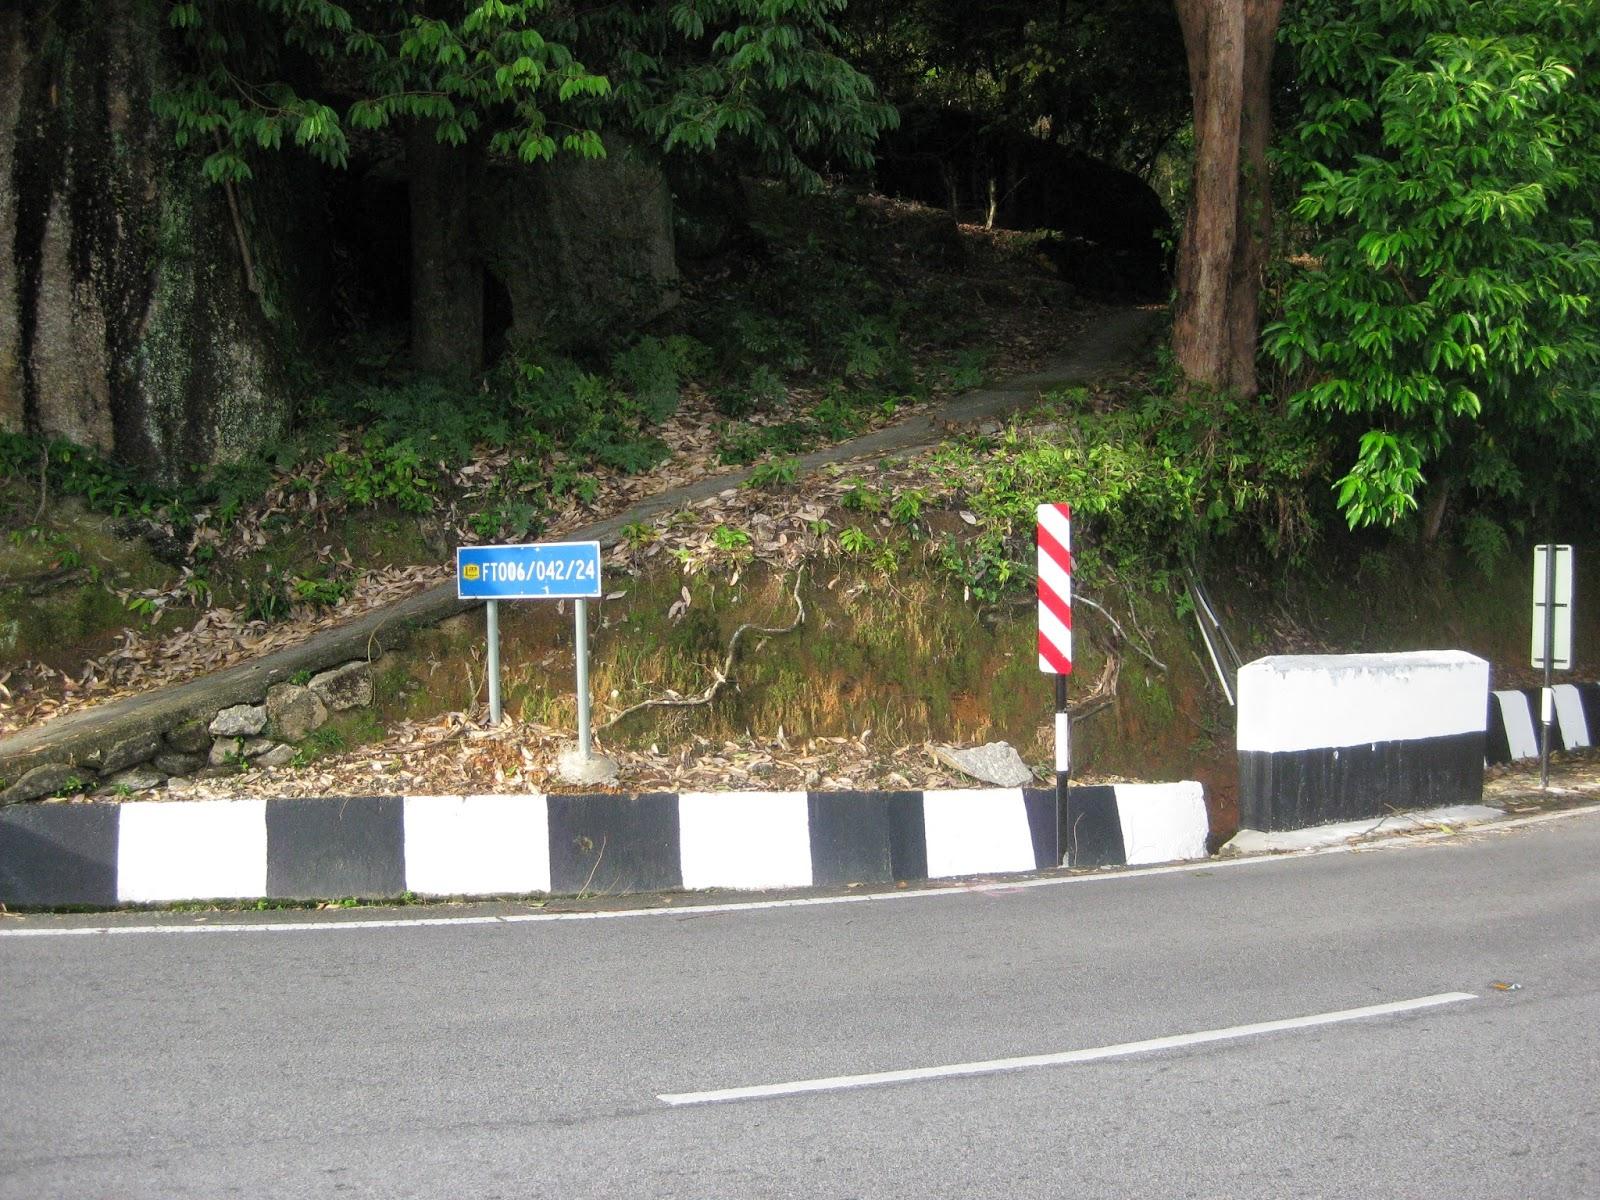 Little Super Chilli: [檳城] 馬來西亞榴槤 @寶盛園 (Bao Sheng Durian Farm)